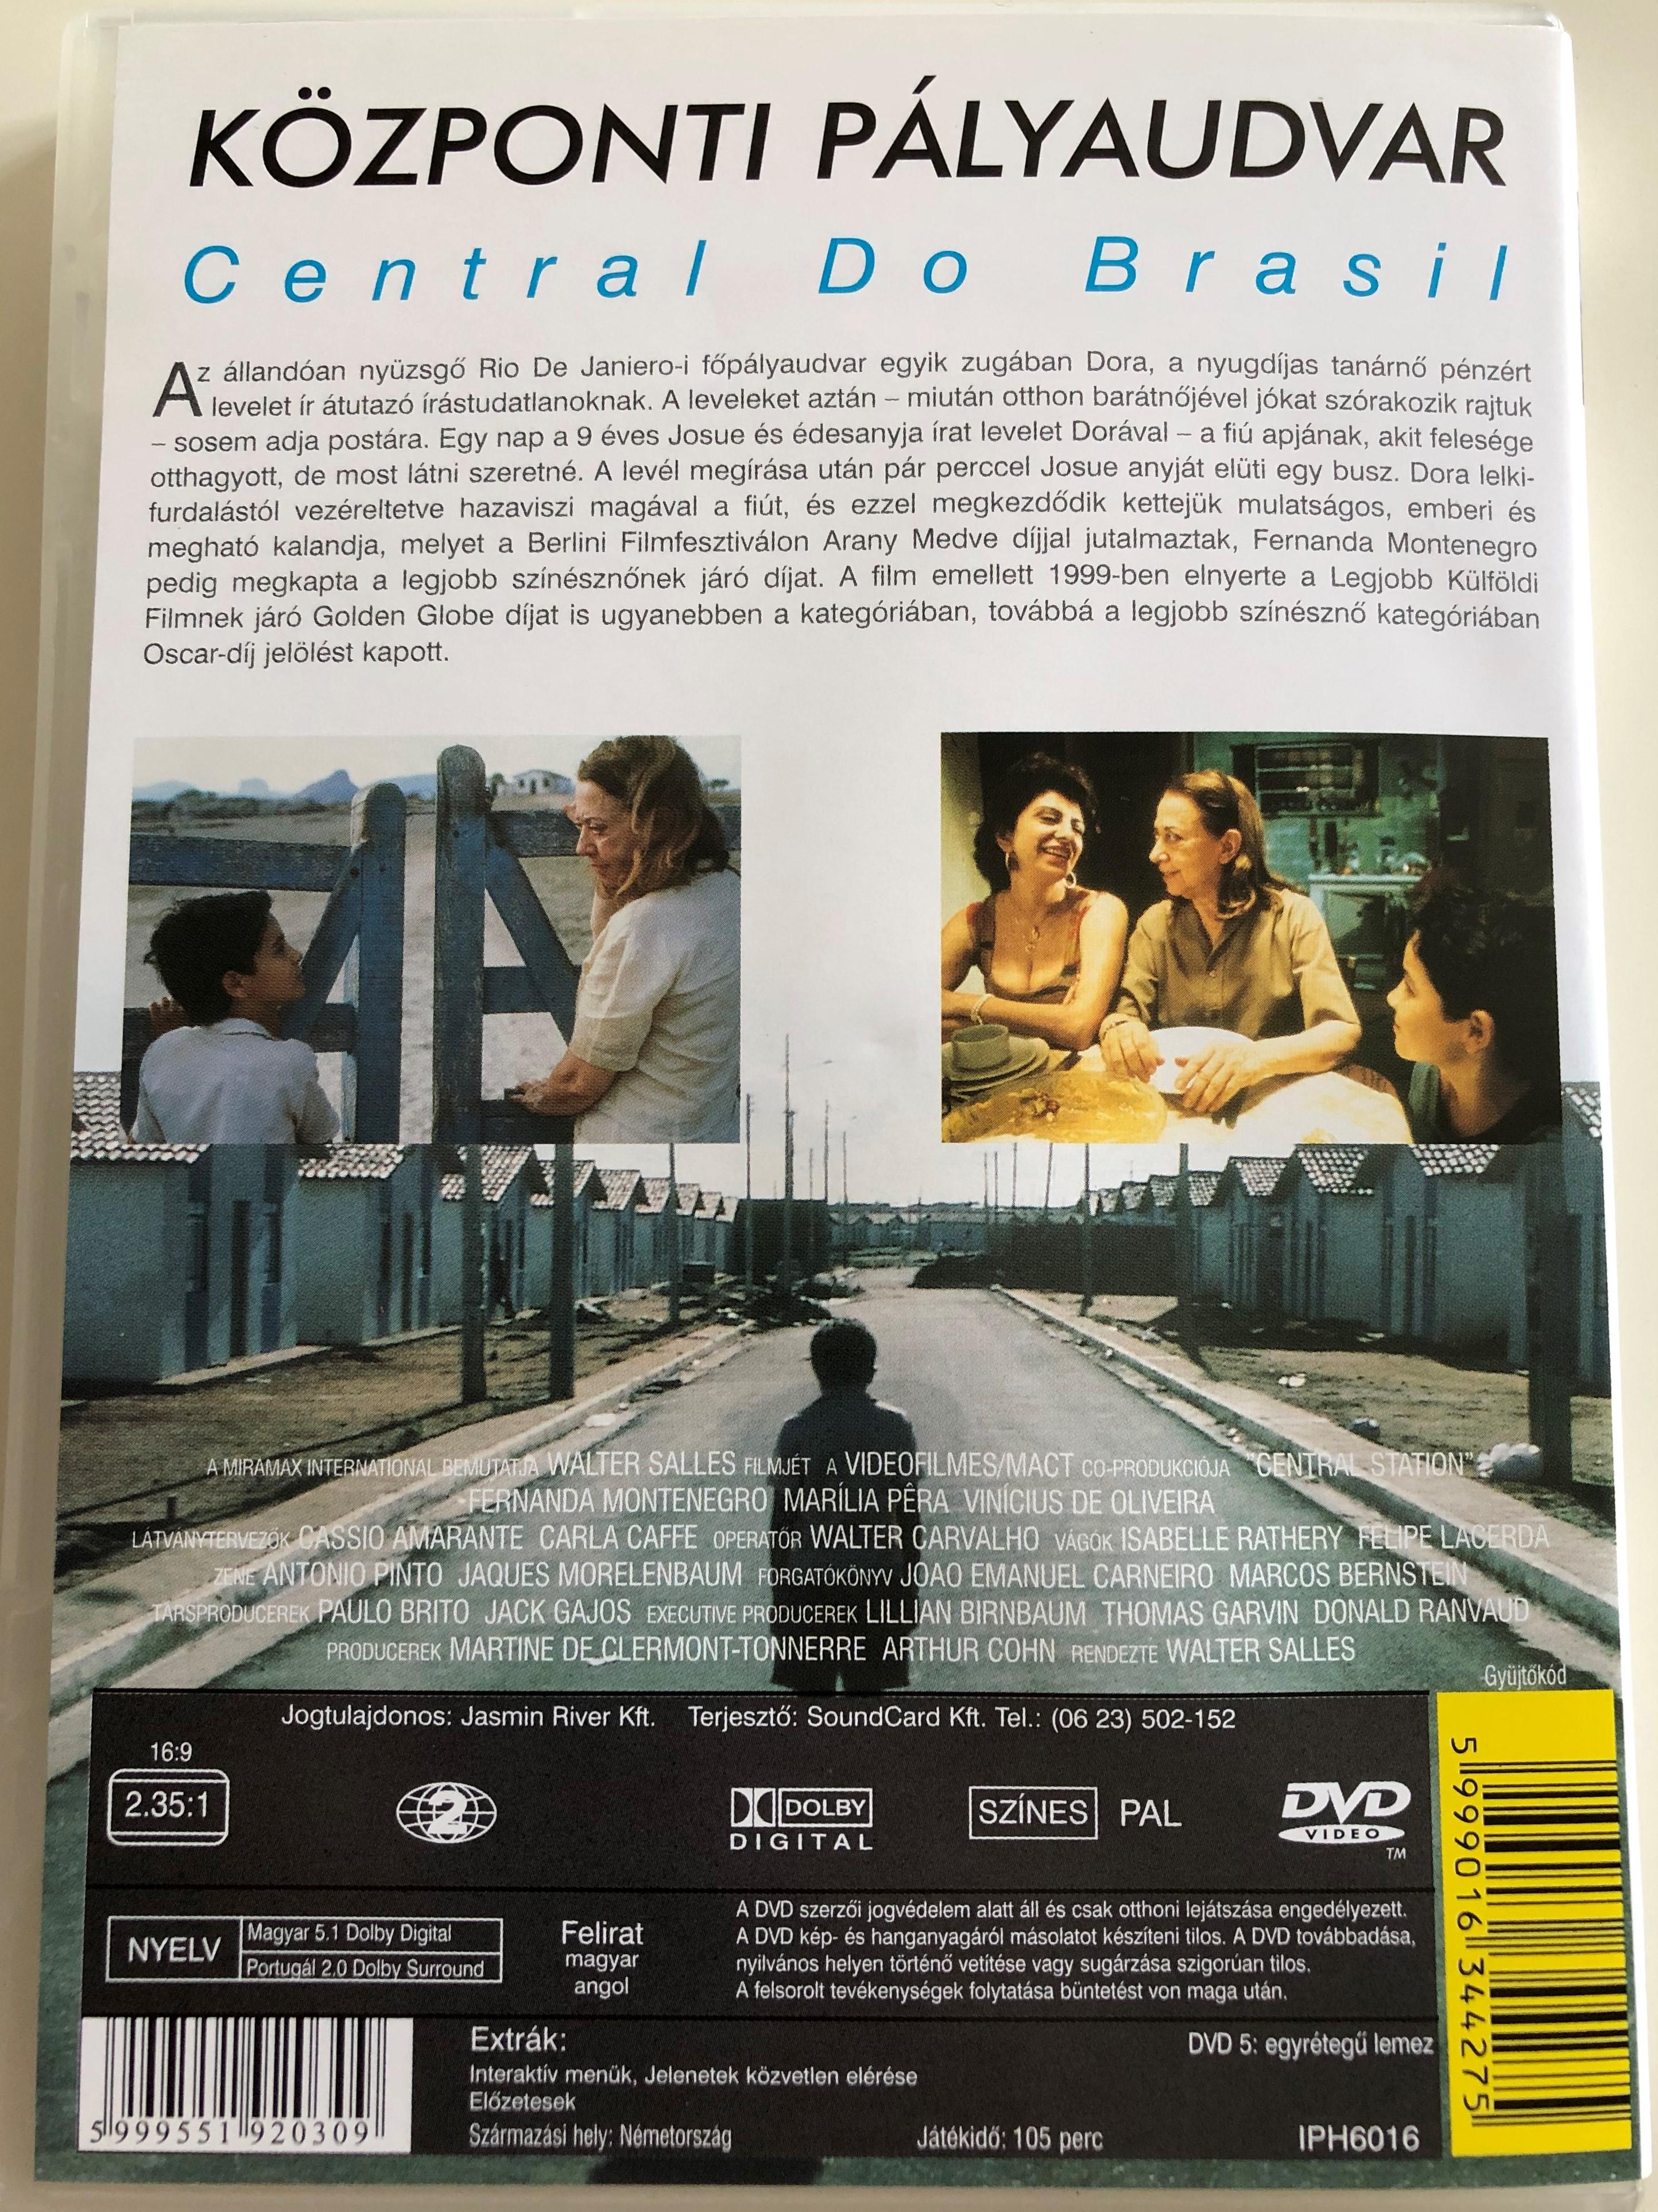 central-do-brasil-dvd-1998-k-zponti-p-lyaudvar-central-station-directed-by-walter-salles-starring-fernanda-montenegro-vin-cius-de-oliveira-mar-lia-p-ra-2-.jpg